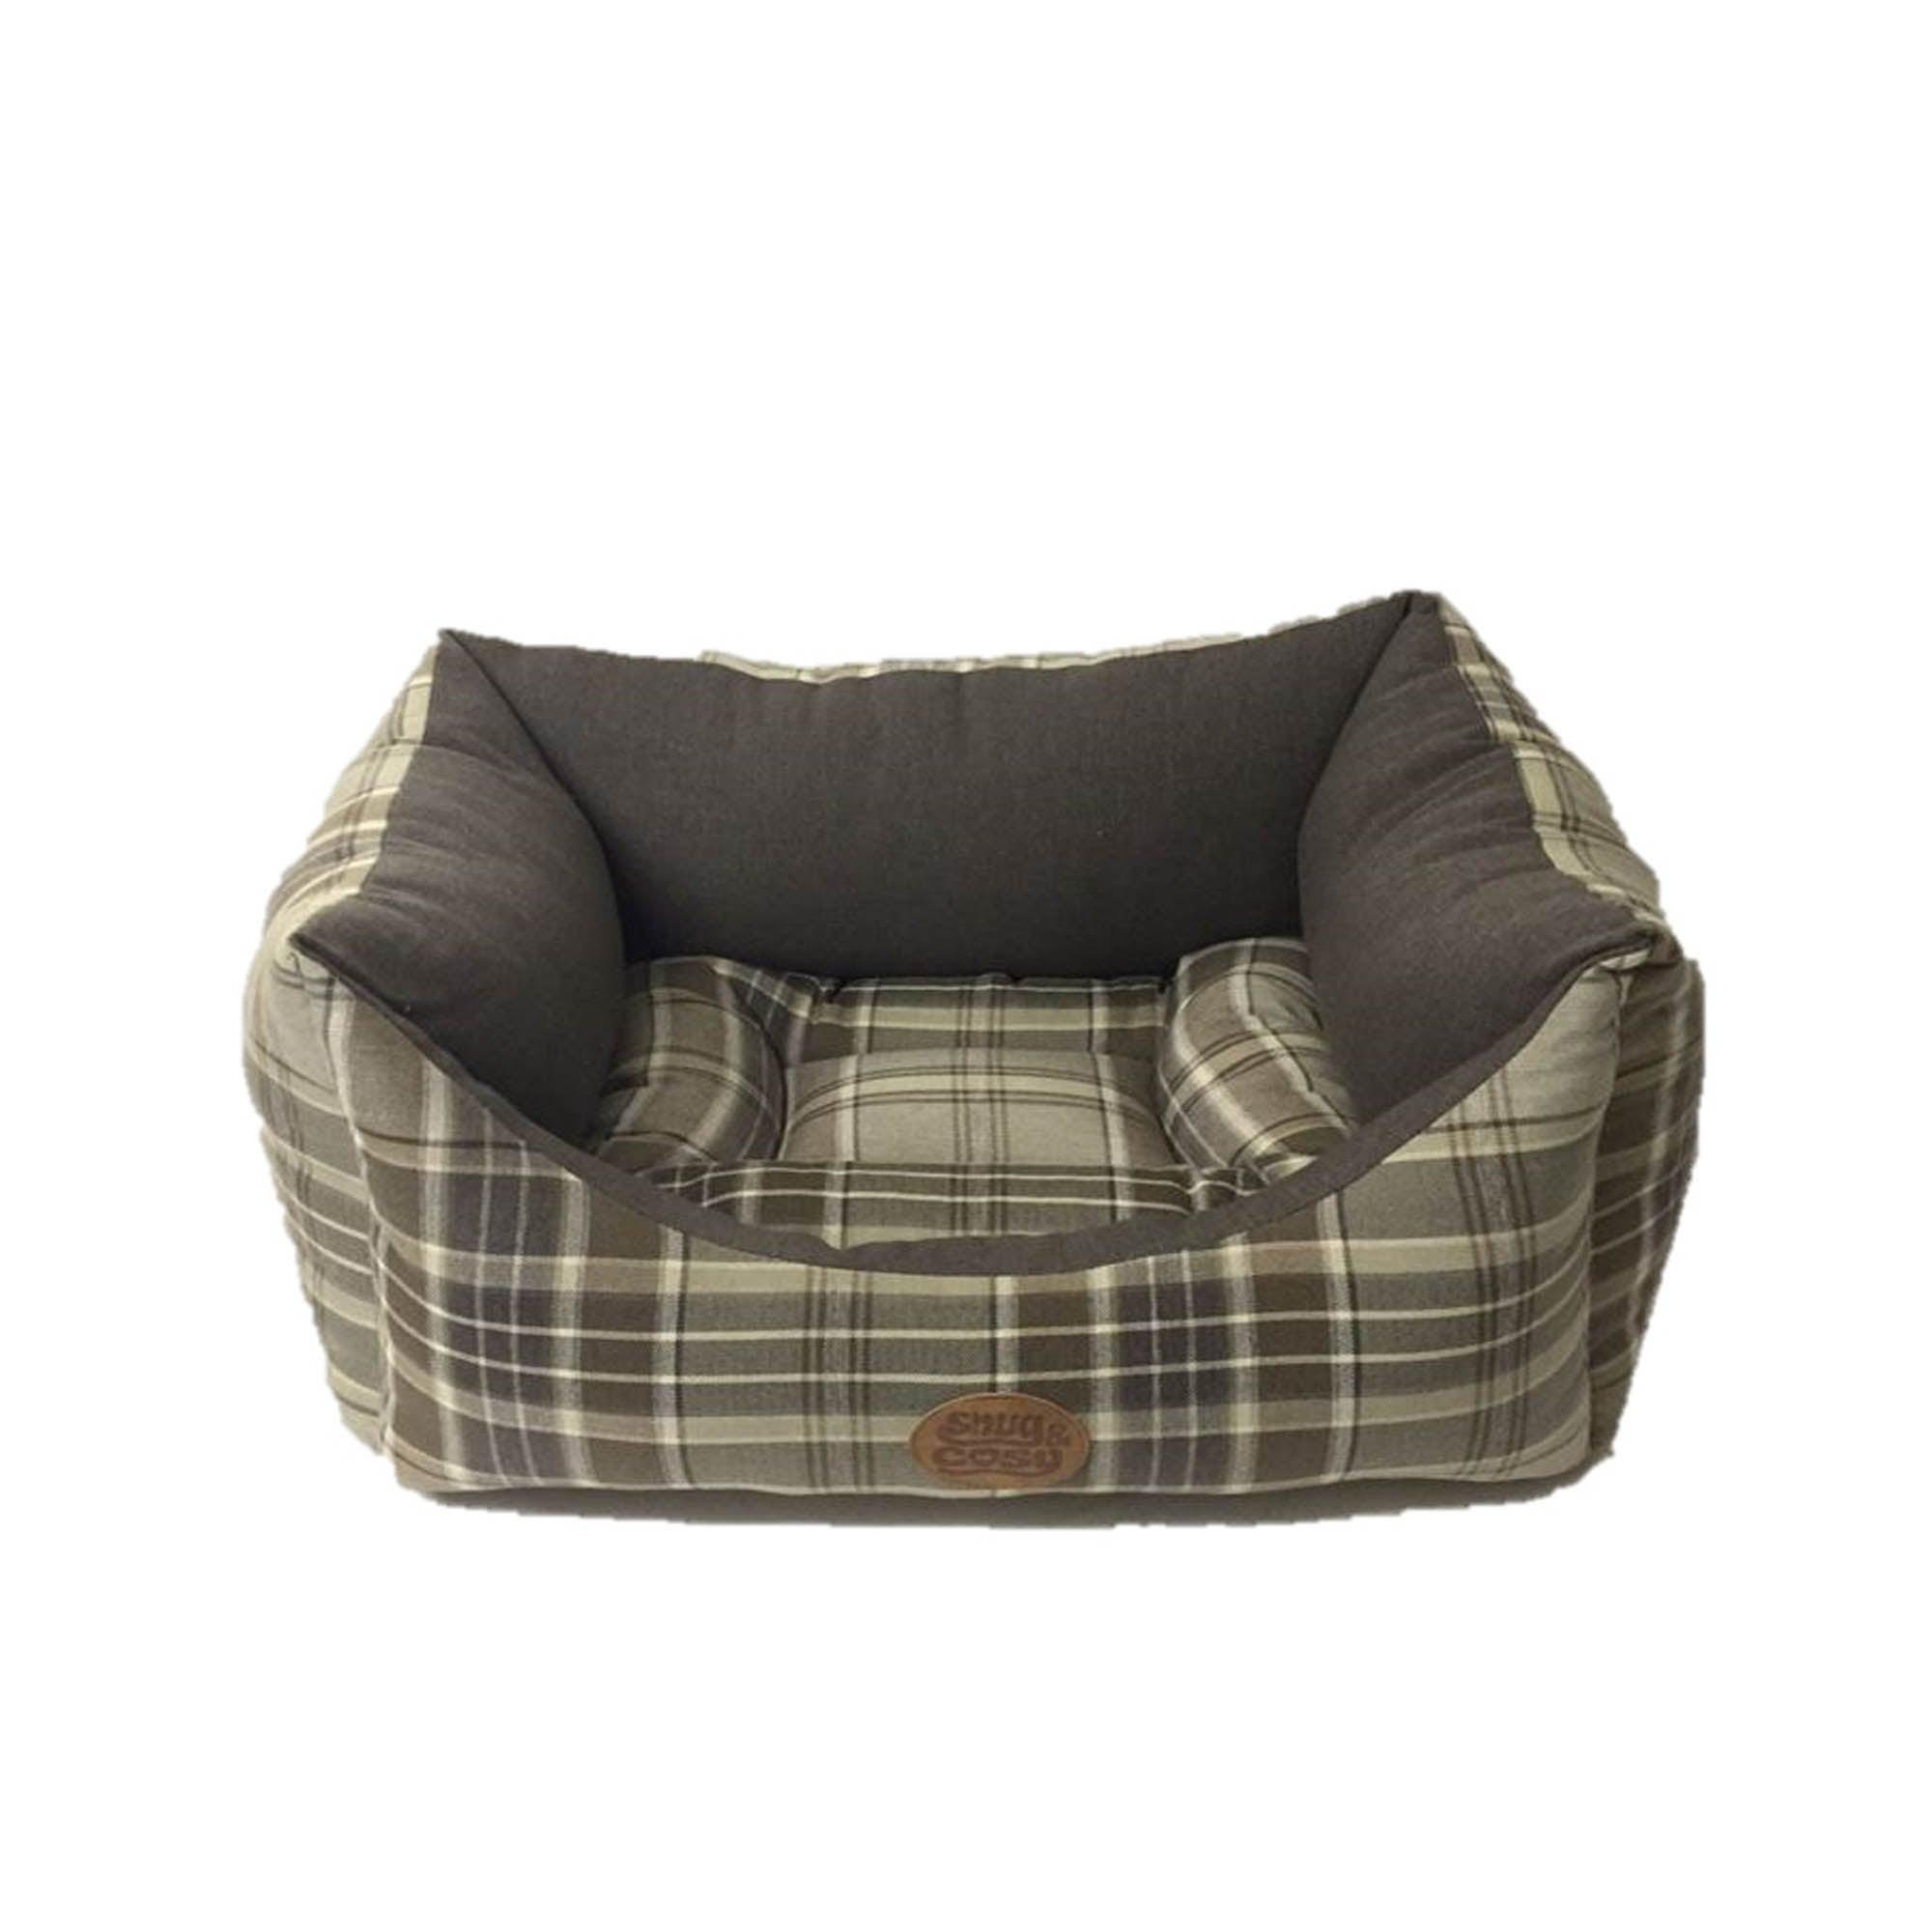 Mayfair Green Check Dog Bed Palo Verdi (Green)